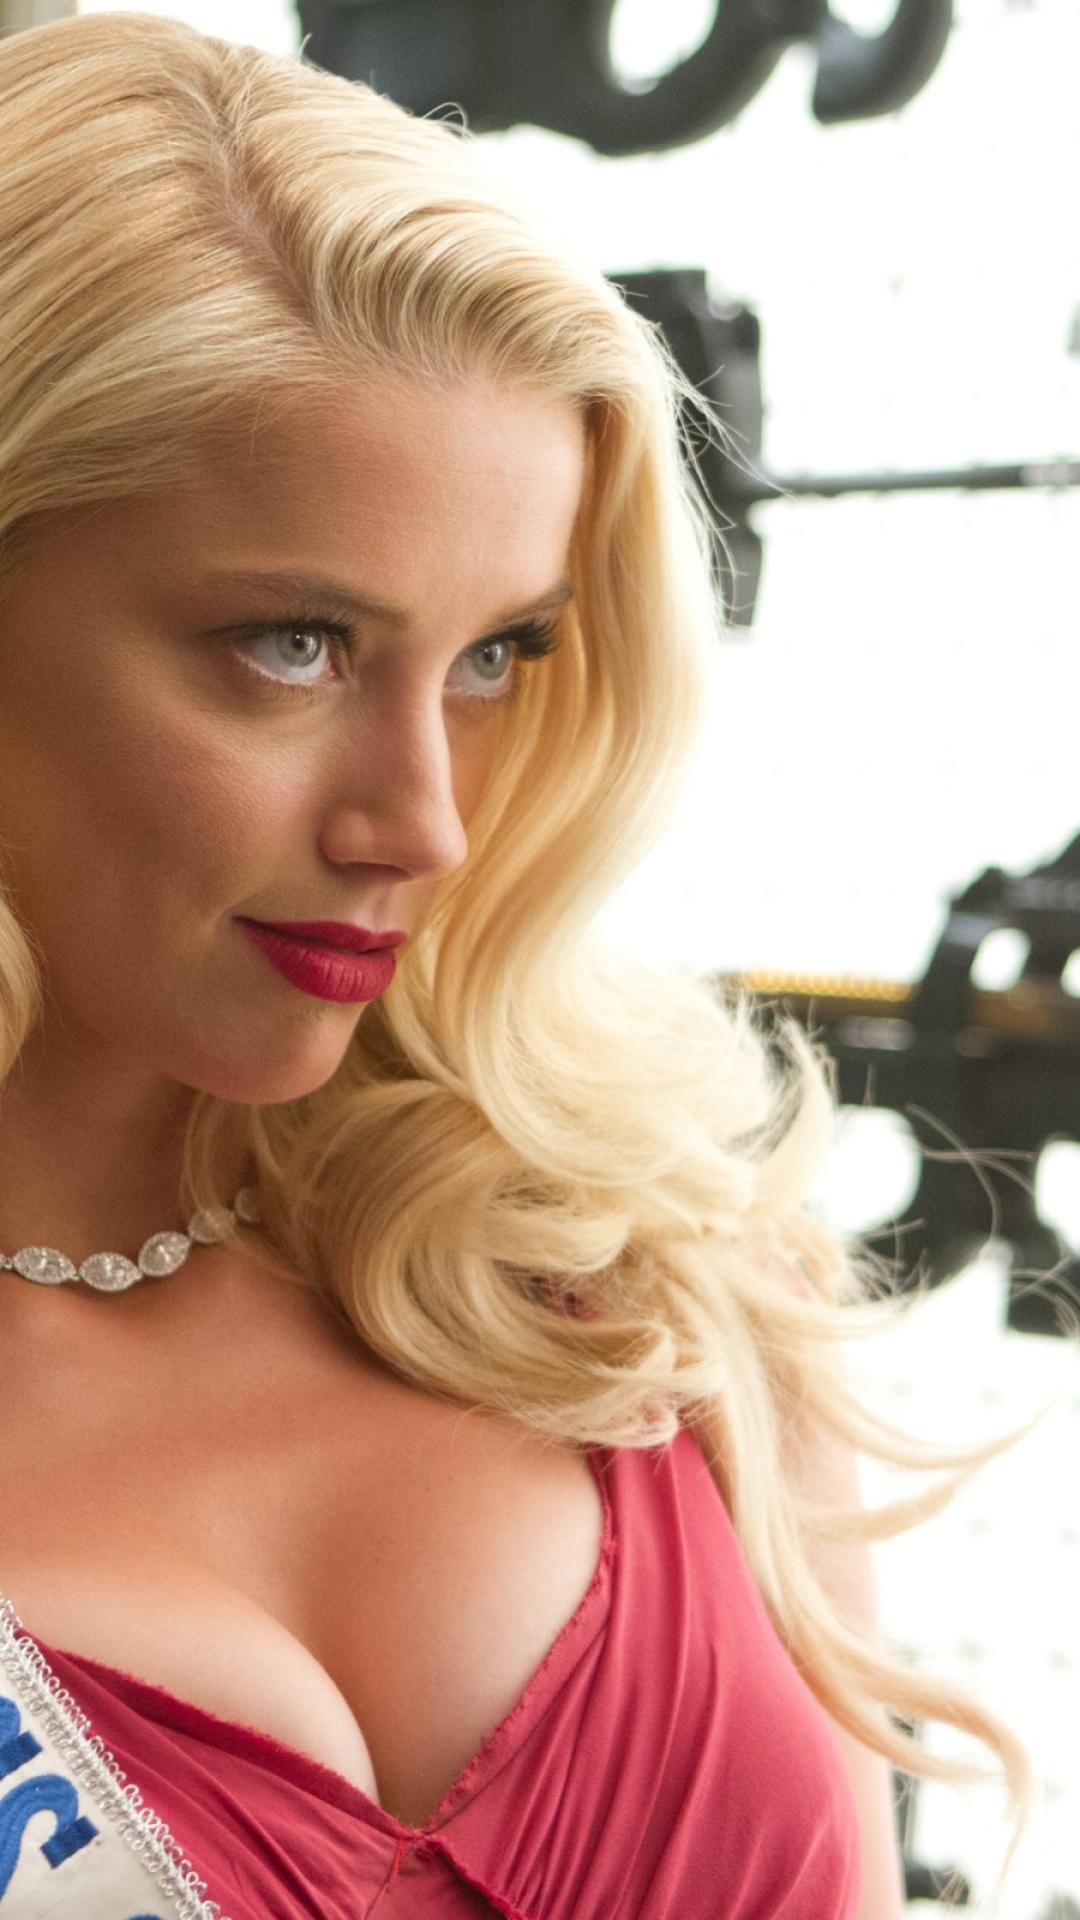 Amber Heard Hot Cleavage Photoshoot Full Hd 2k Wallpaper